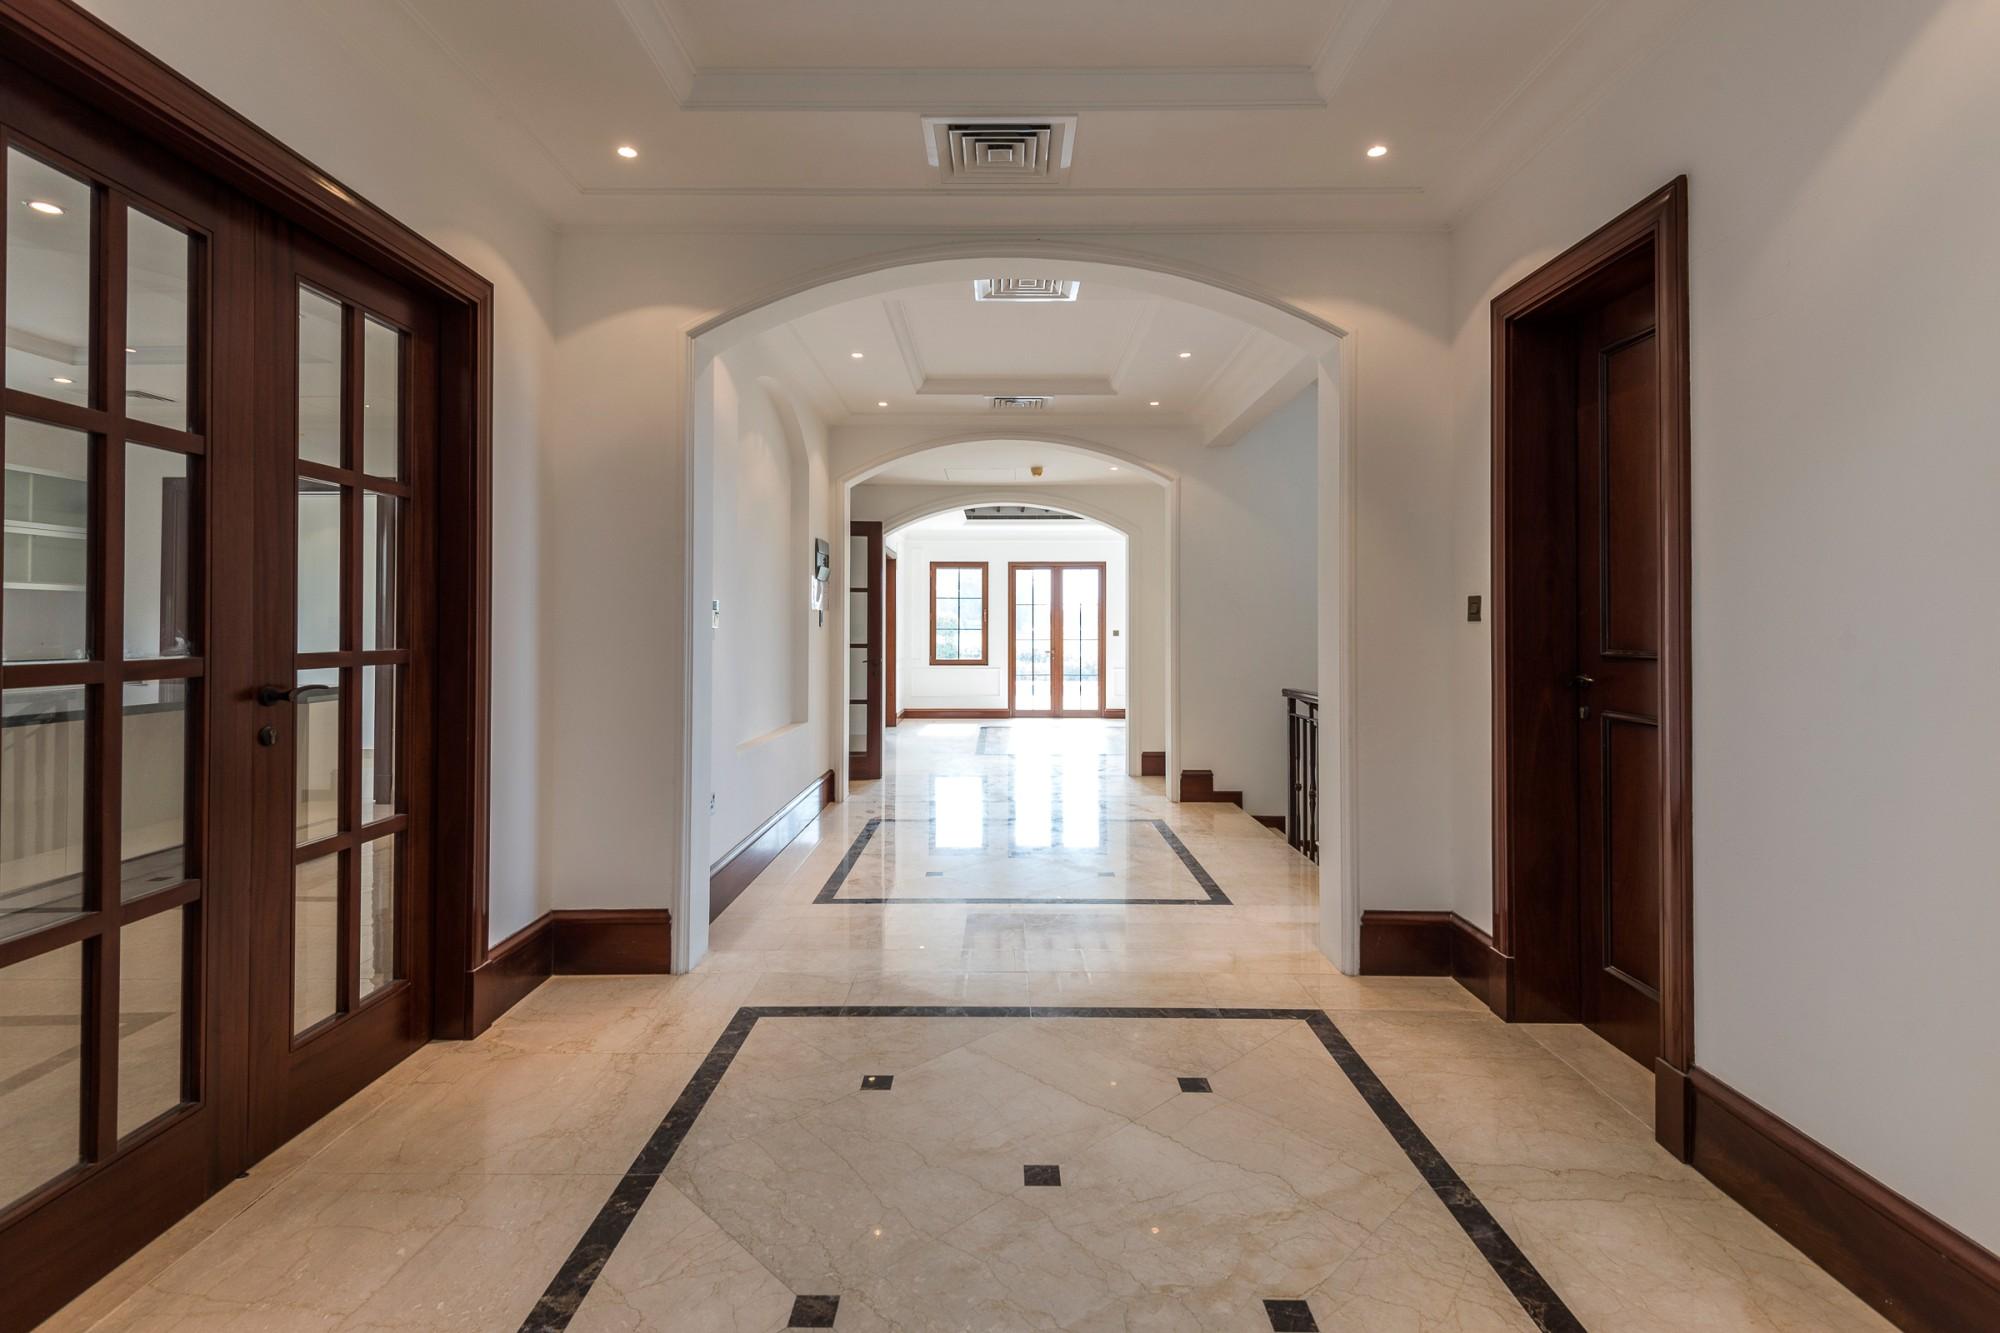 6 Bedroom + Basement Villa Private Pool Golf View